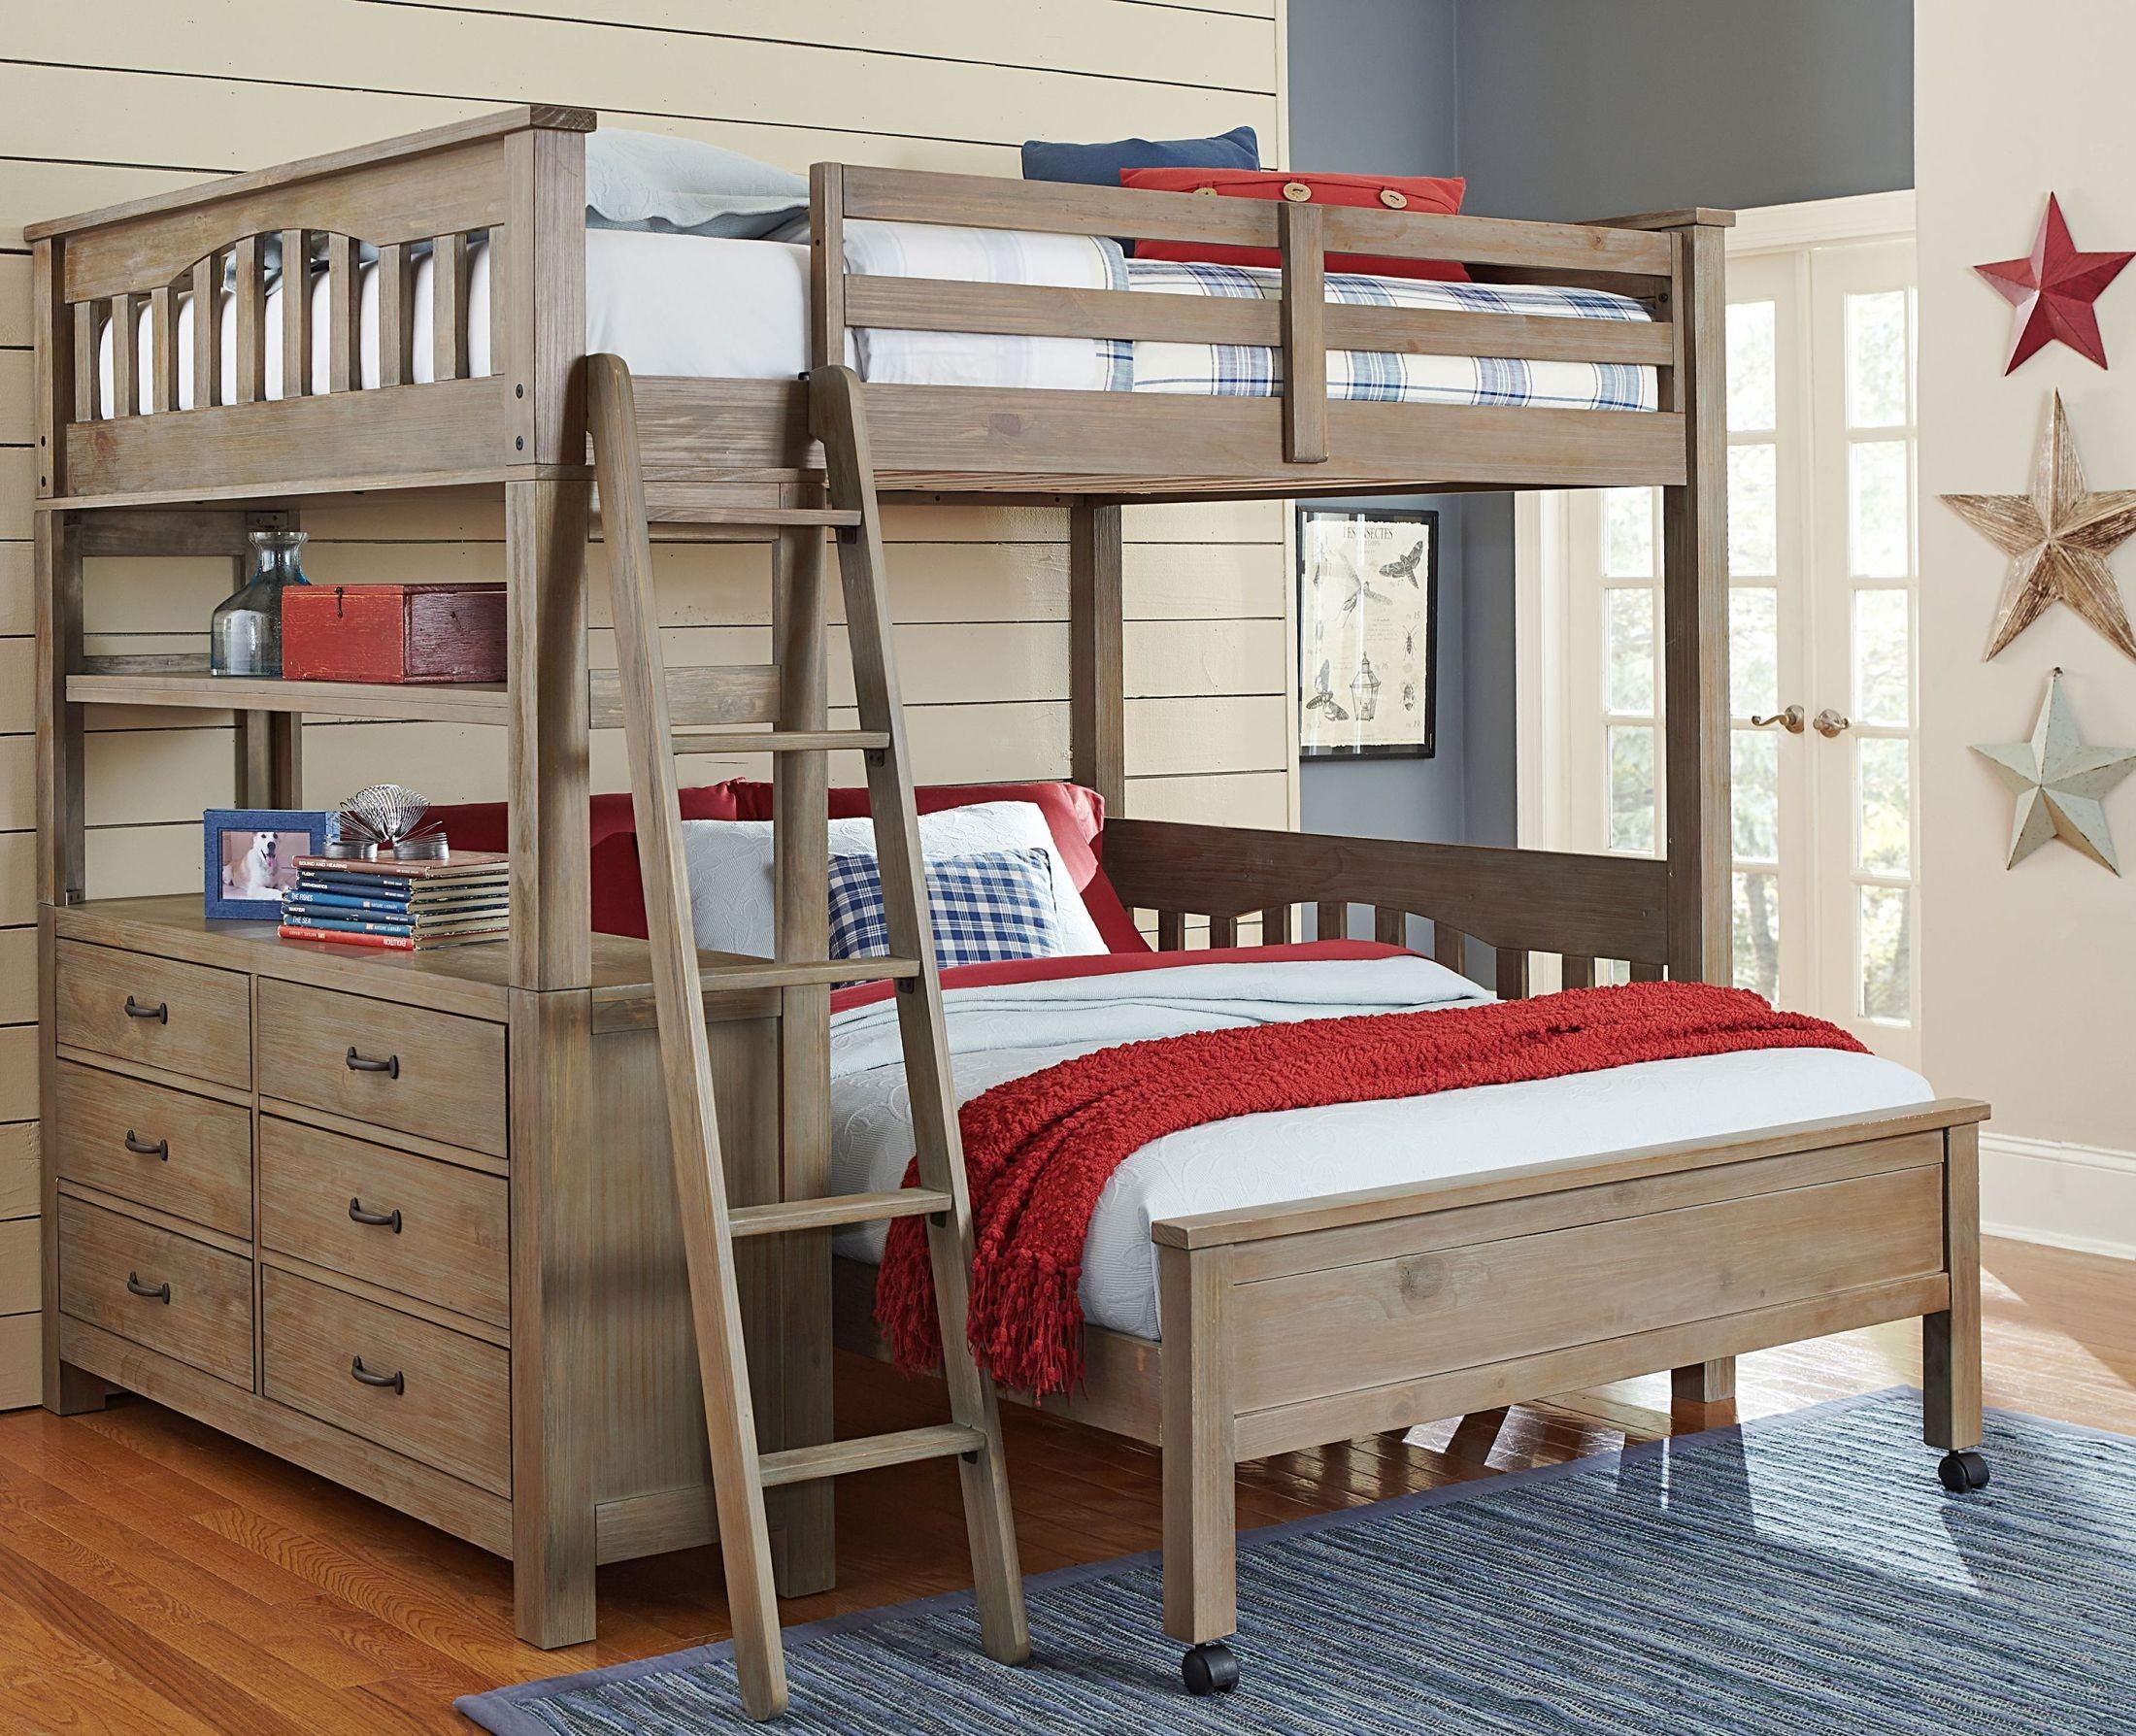 Highlands Driftwood Full Loft Bed With Full Lower Bed 10080NLFB NE Kids